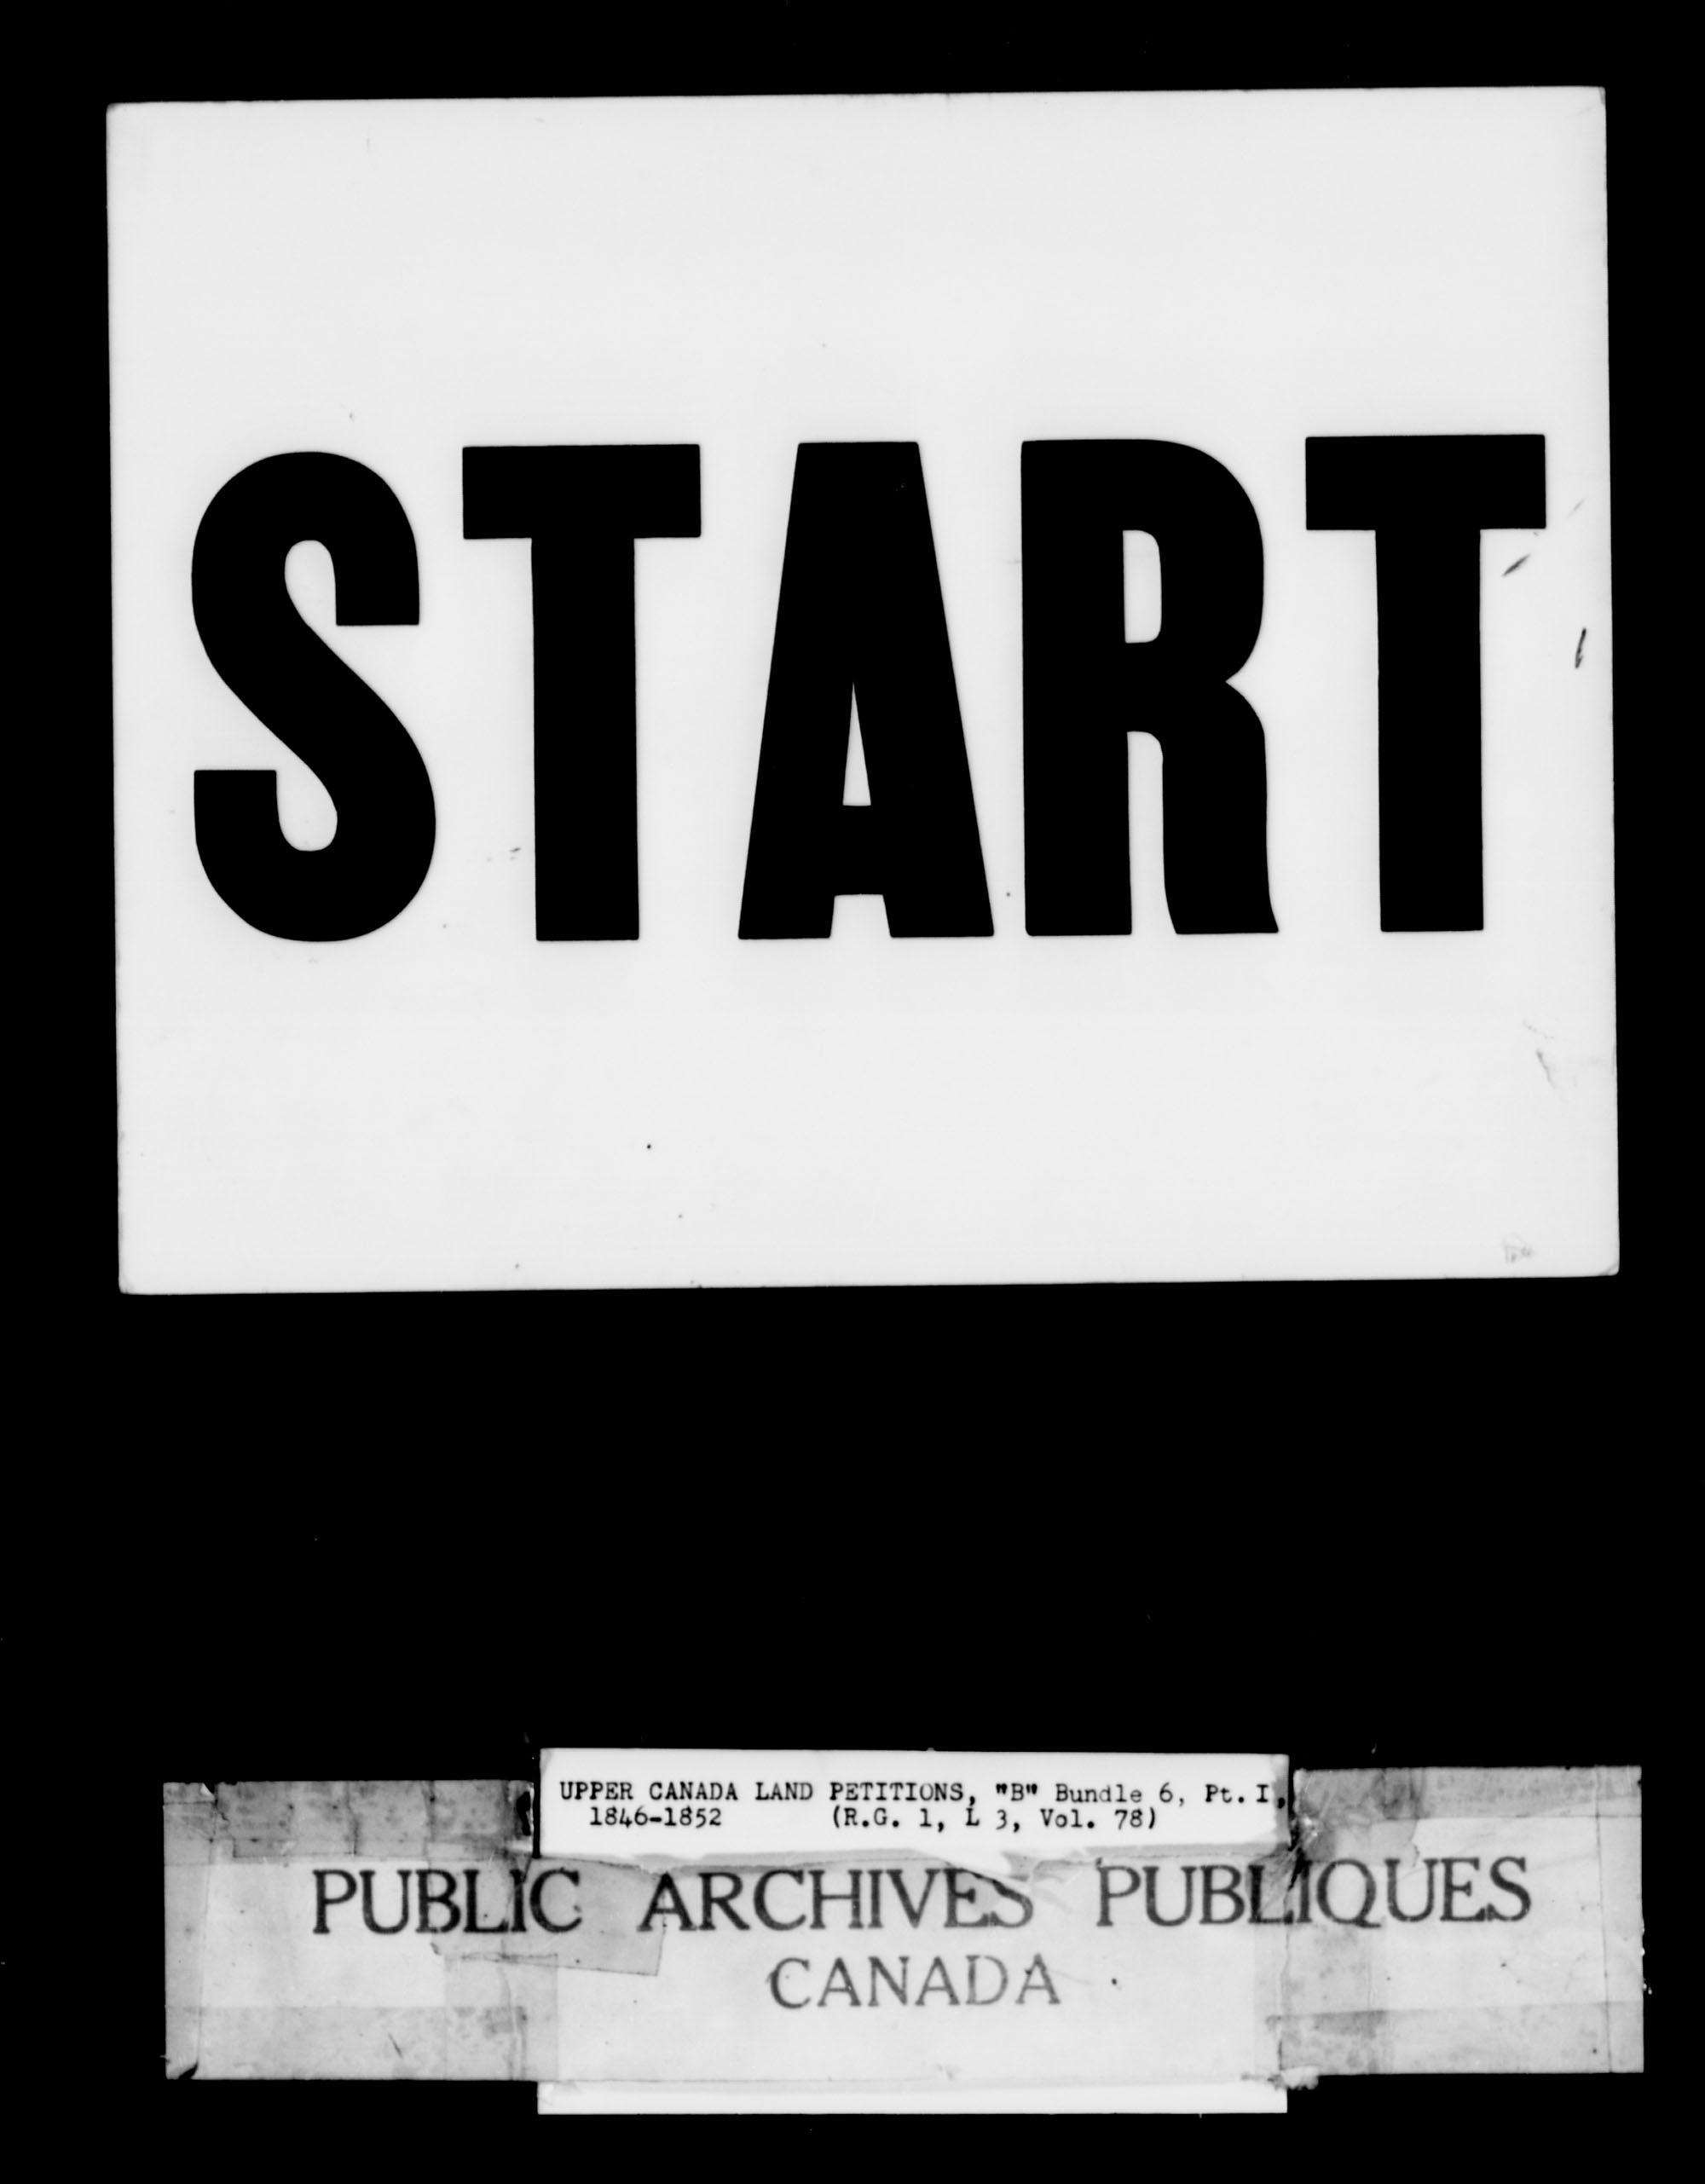 Titre: Demandes de terres du Haut-Canada (1763-1865) - N° d'enregistrement Mikan: 205131 - Microforme: c-1642